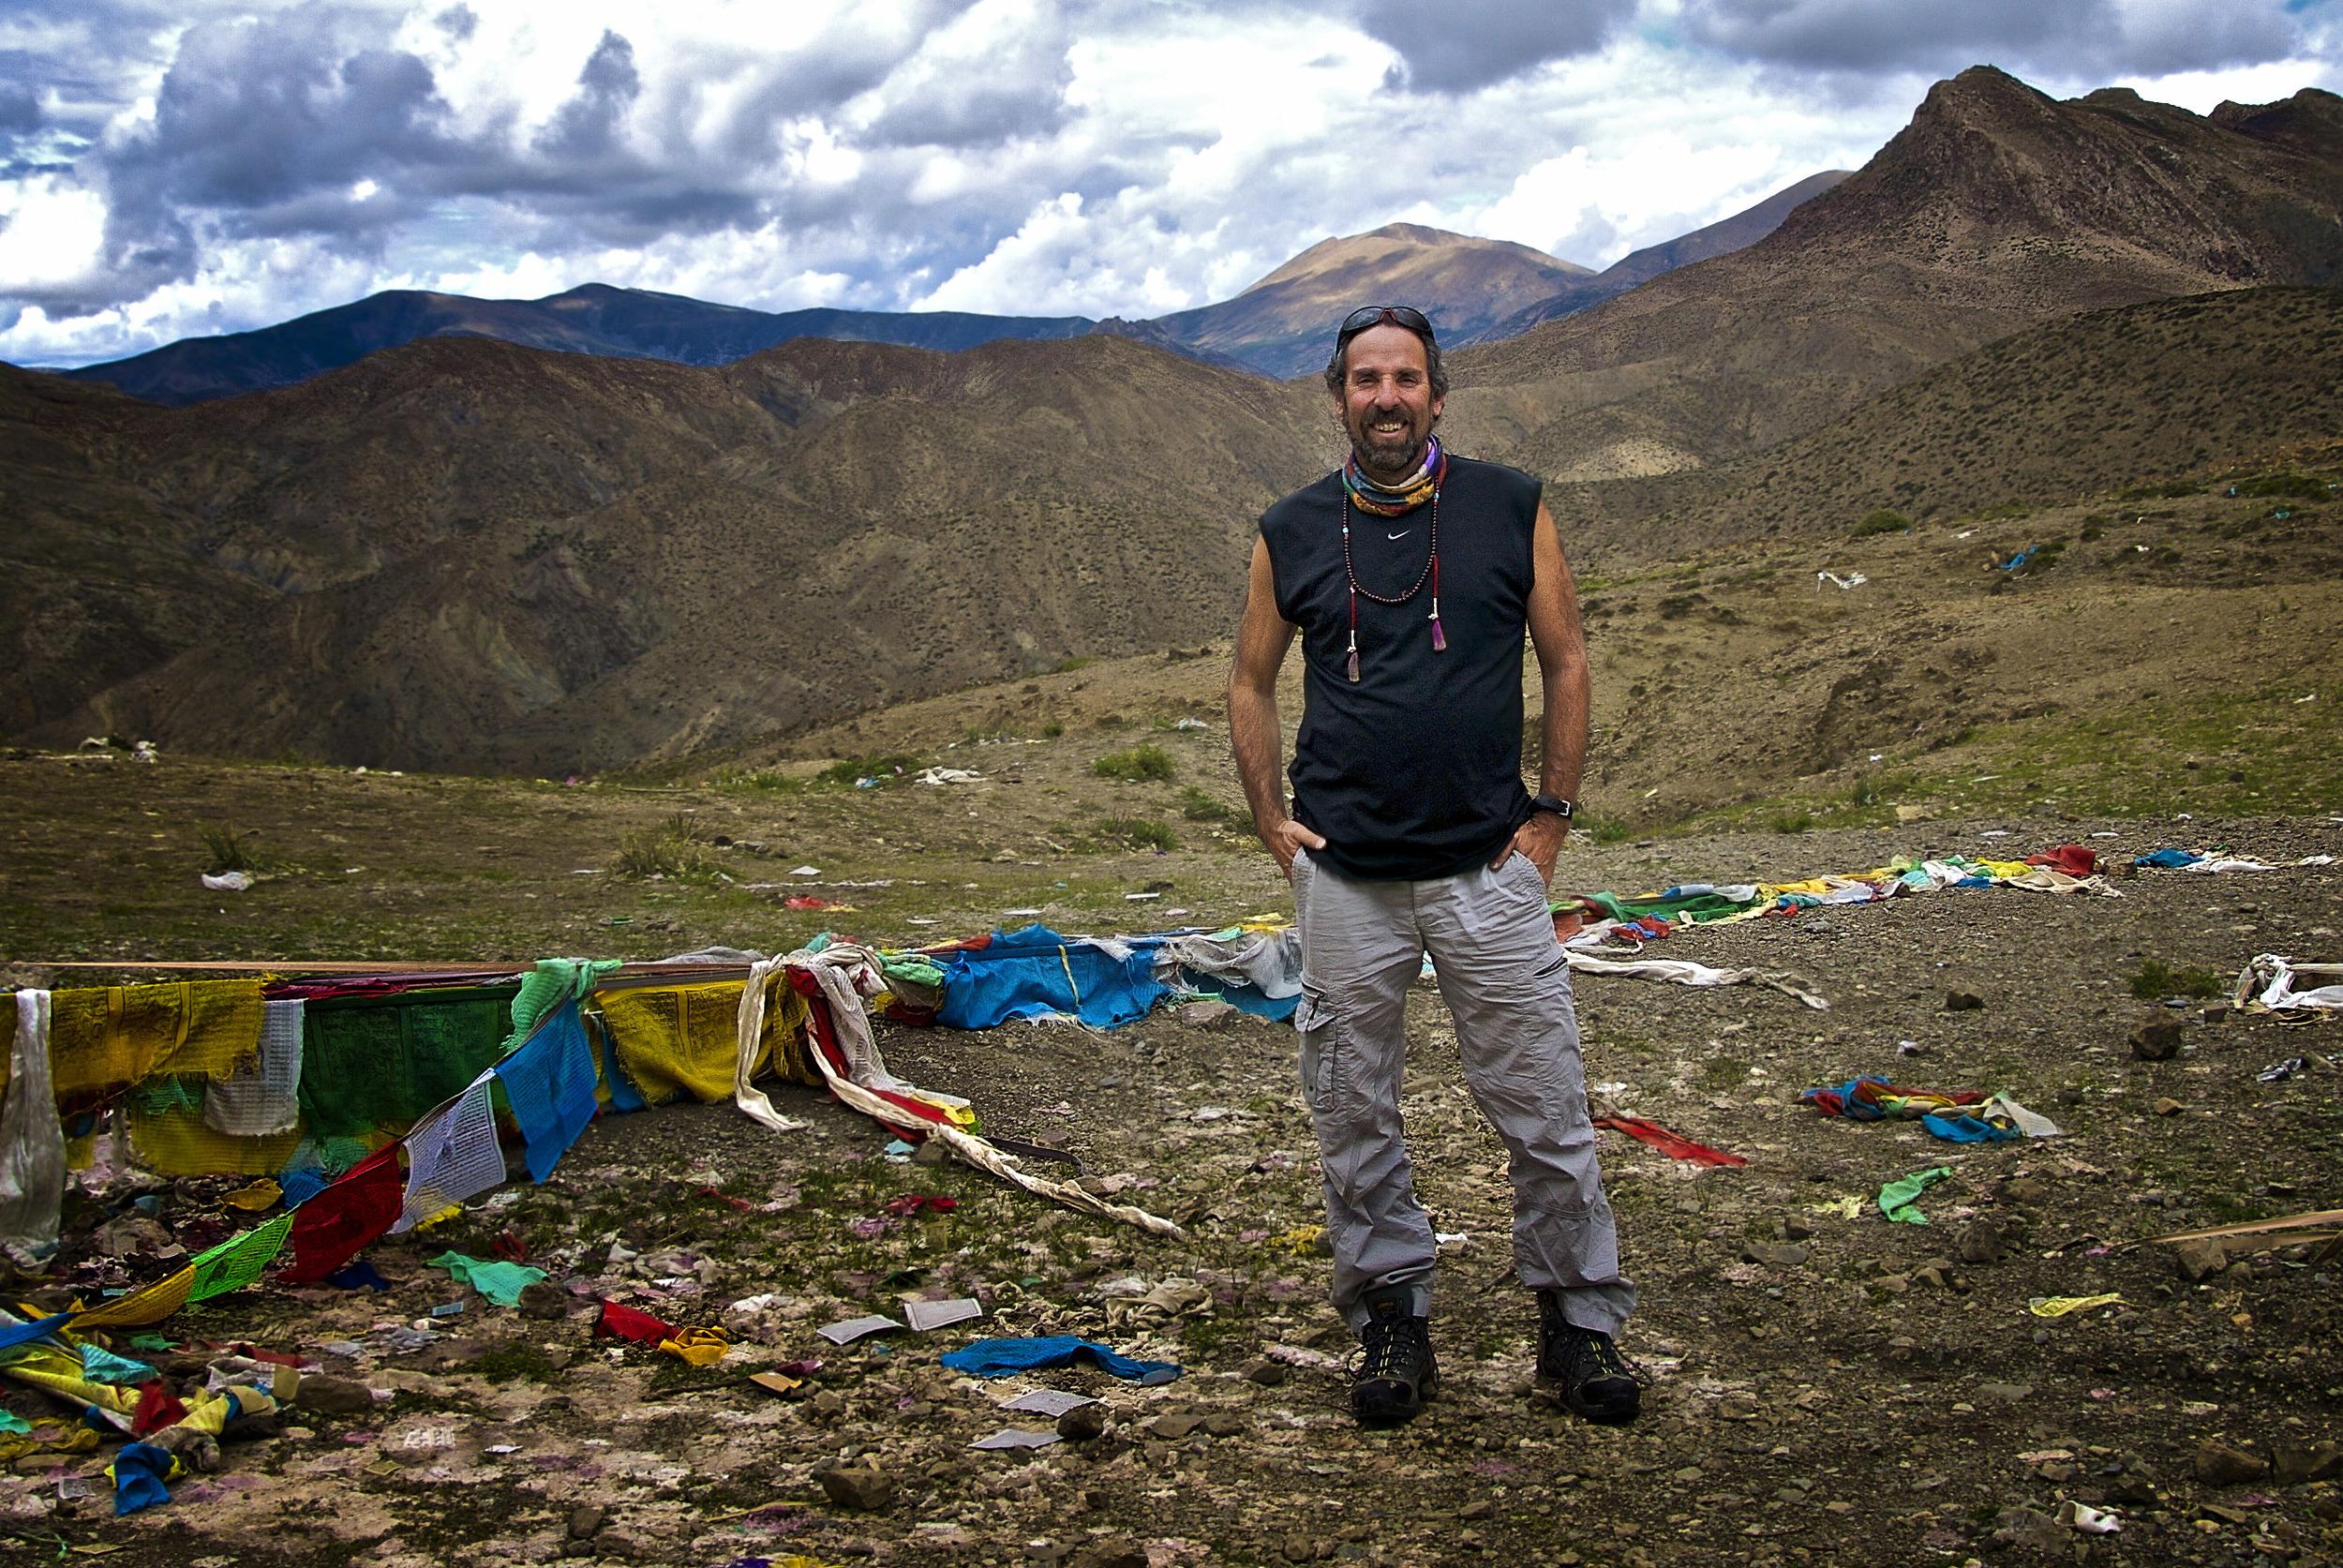 R H, Tibetan Plateau